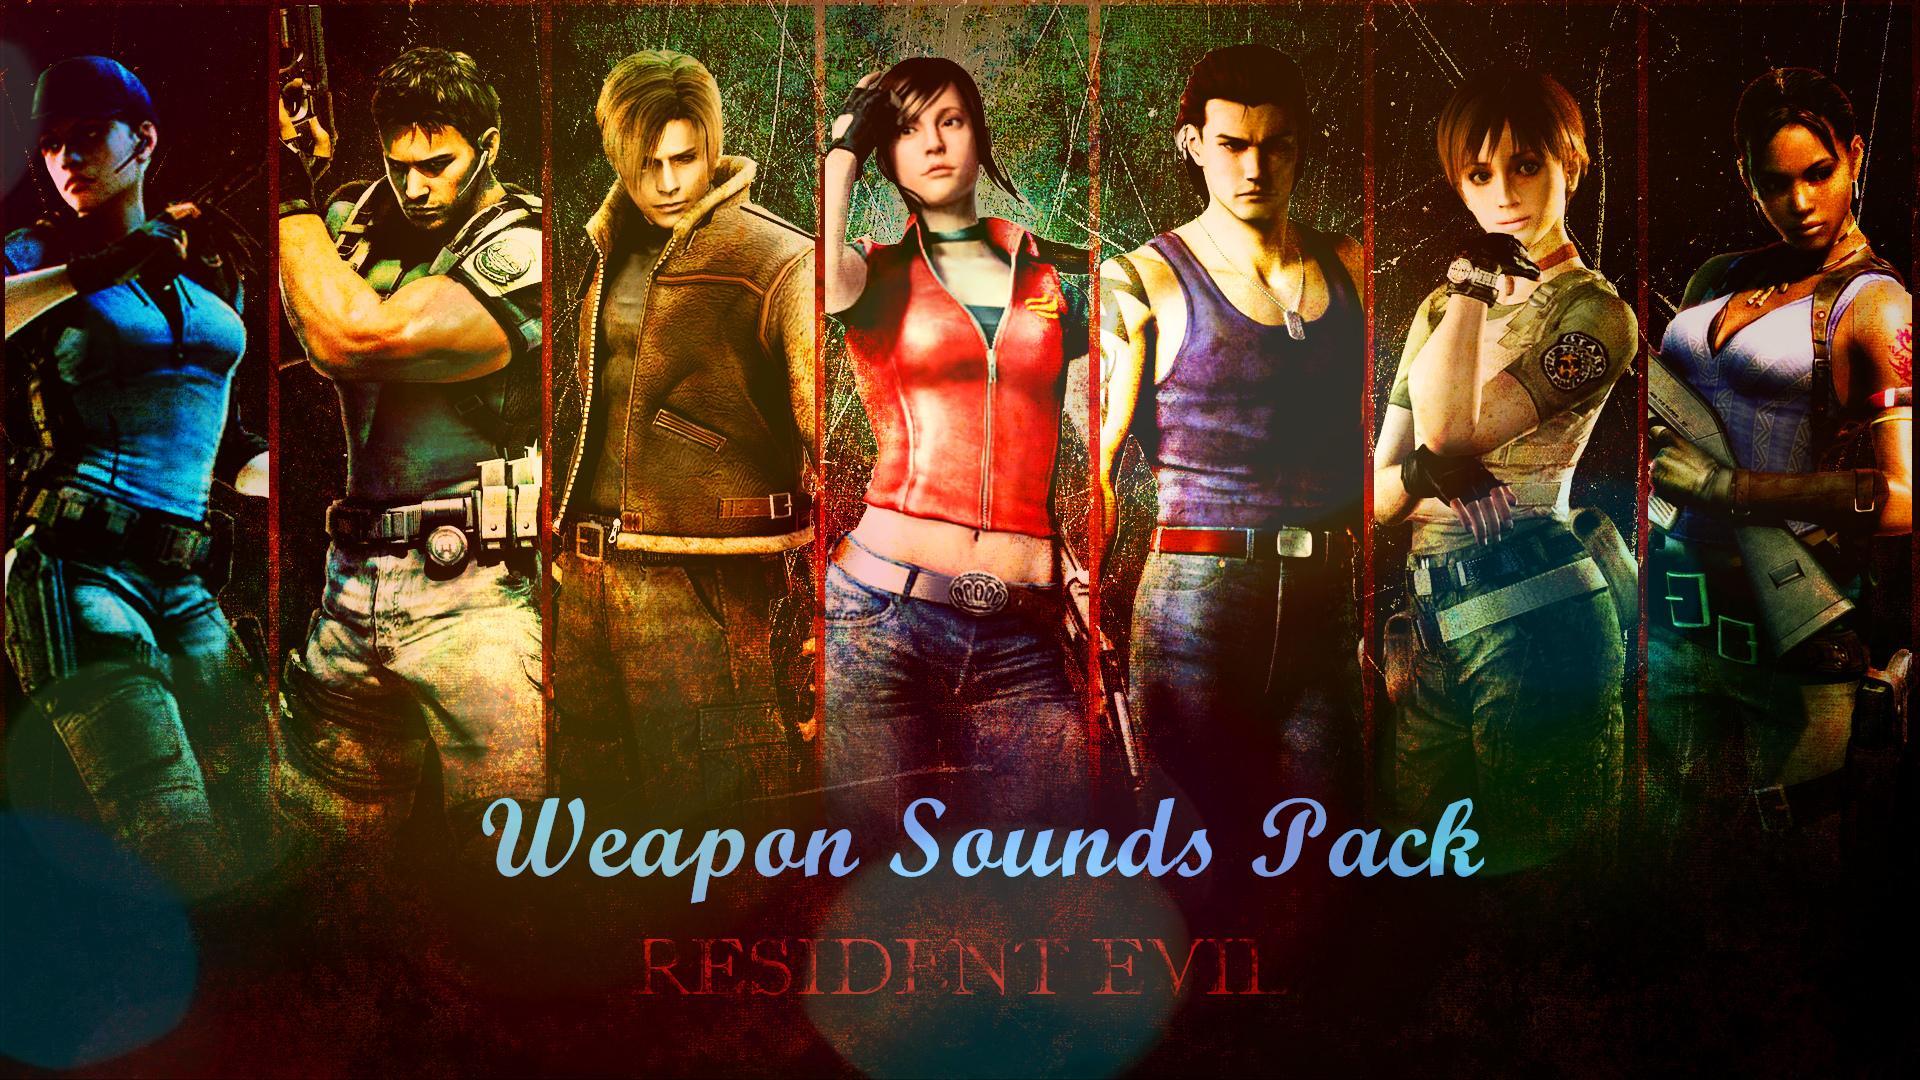 Wallpaper Gun Video Games Black Background Resident: Resident Evil Series Weapon Sounds Pack